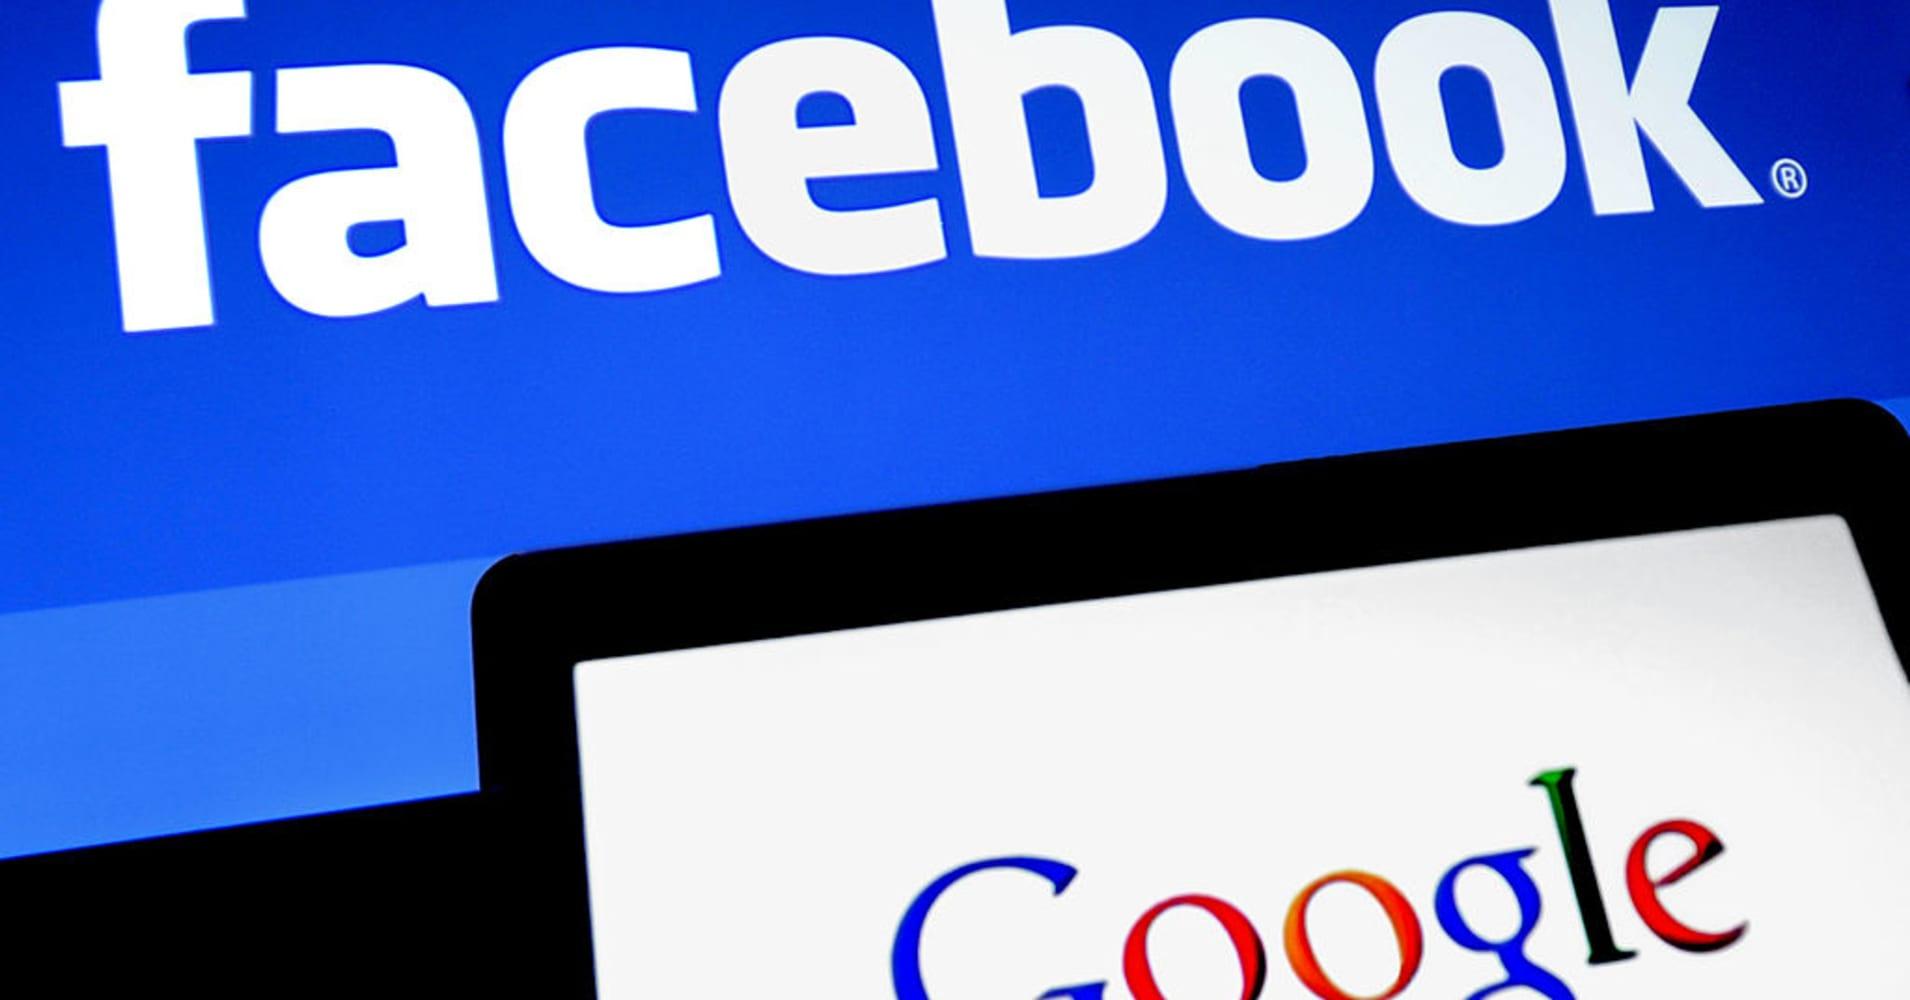 Facebook, Google should be investigated for dominating digital advertising, UK finance minister says